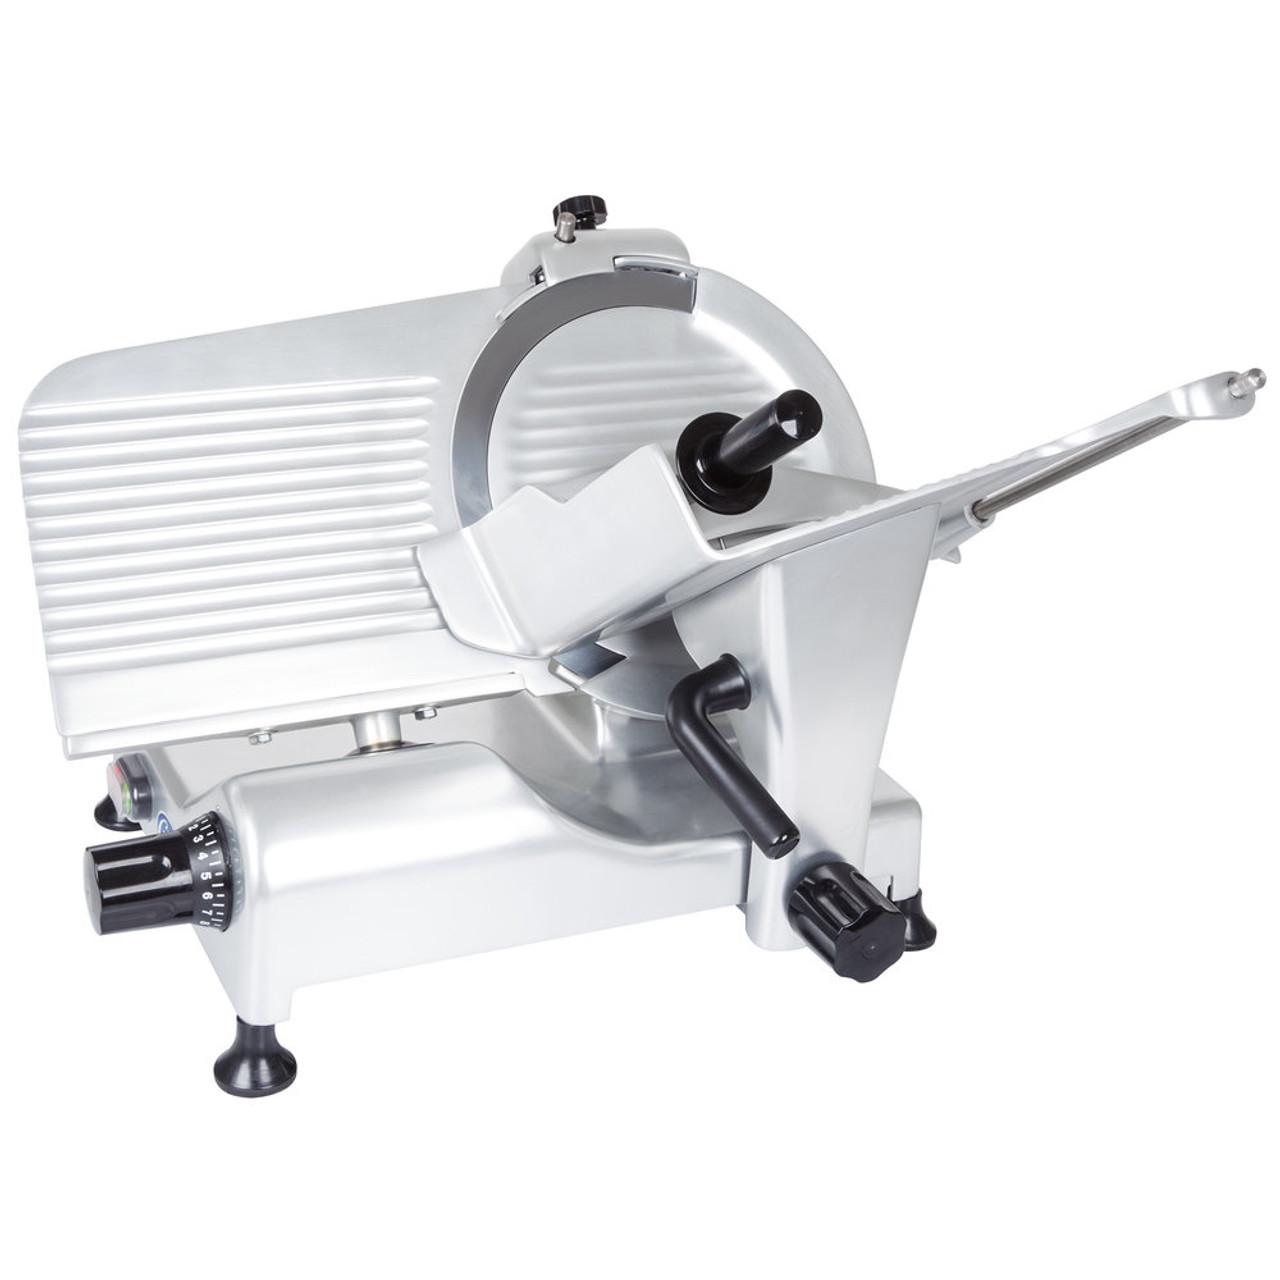 "Globe G12 12"" Manual Gravity Feed Slicer - 1/2 hp"